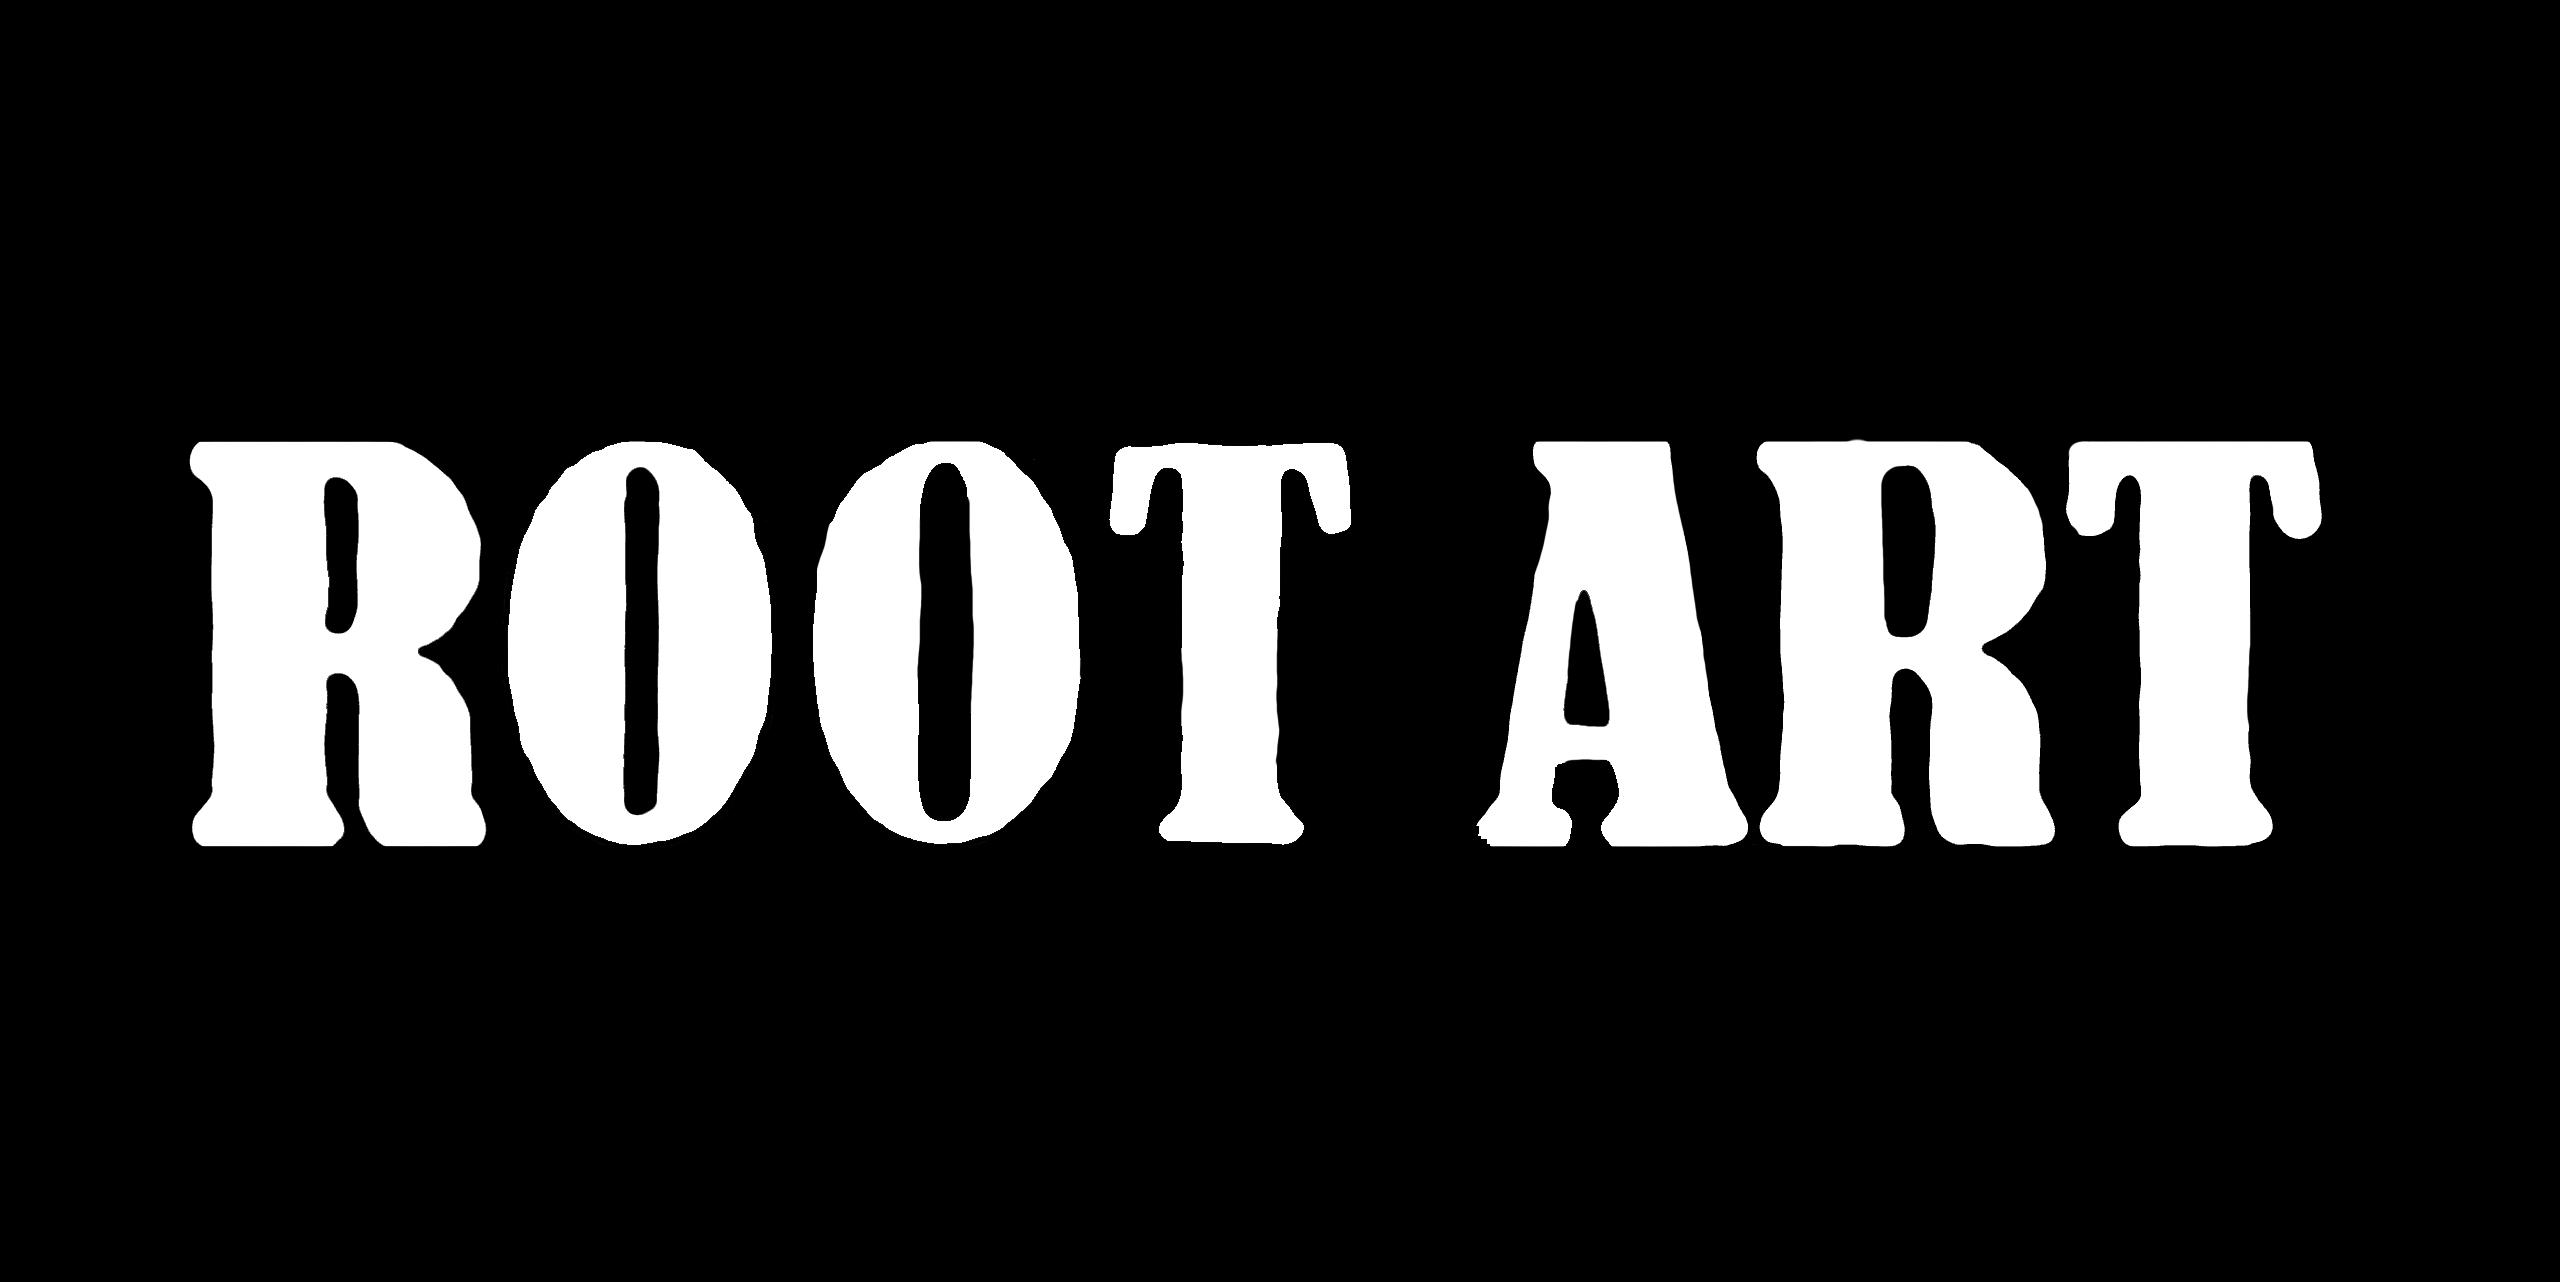 ارت روت | Art Root